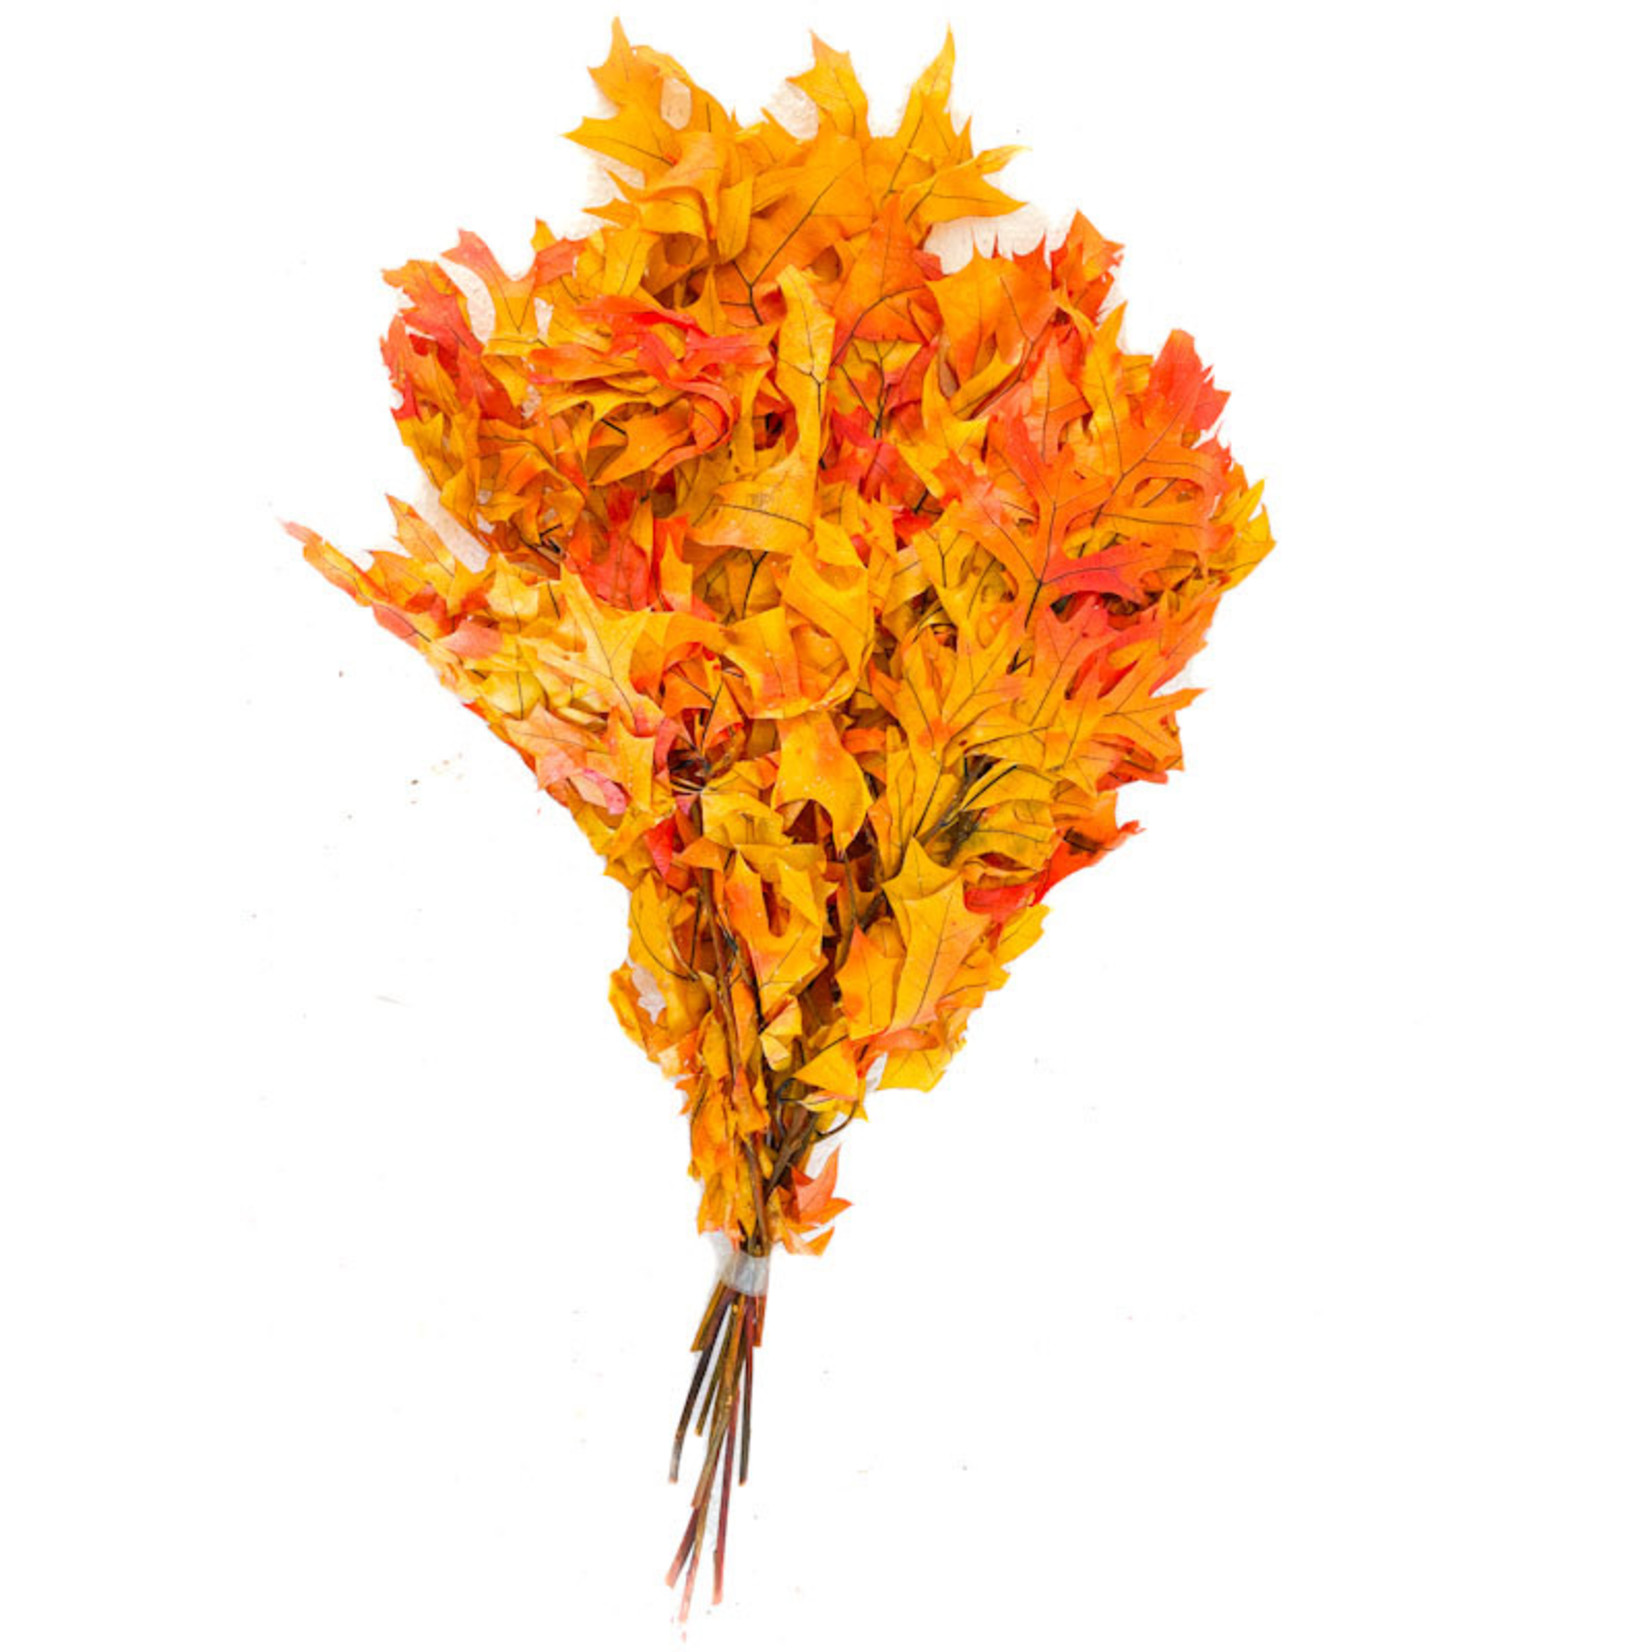 Oak Leaves - Autumn 4 oz